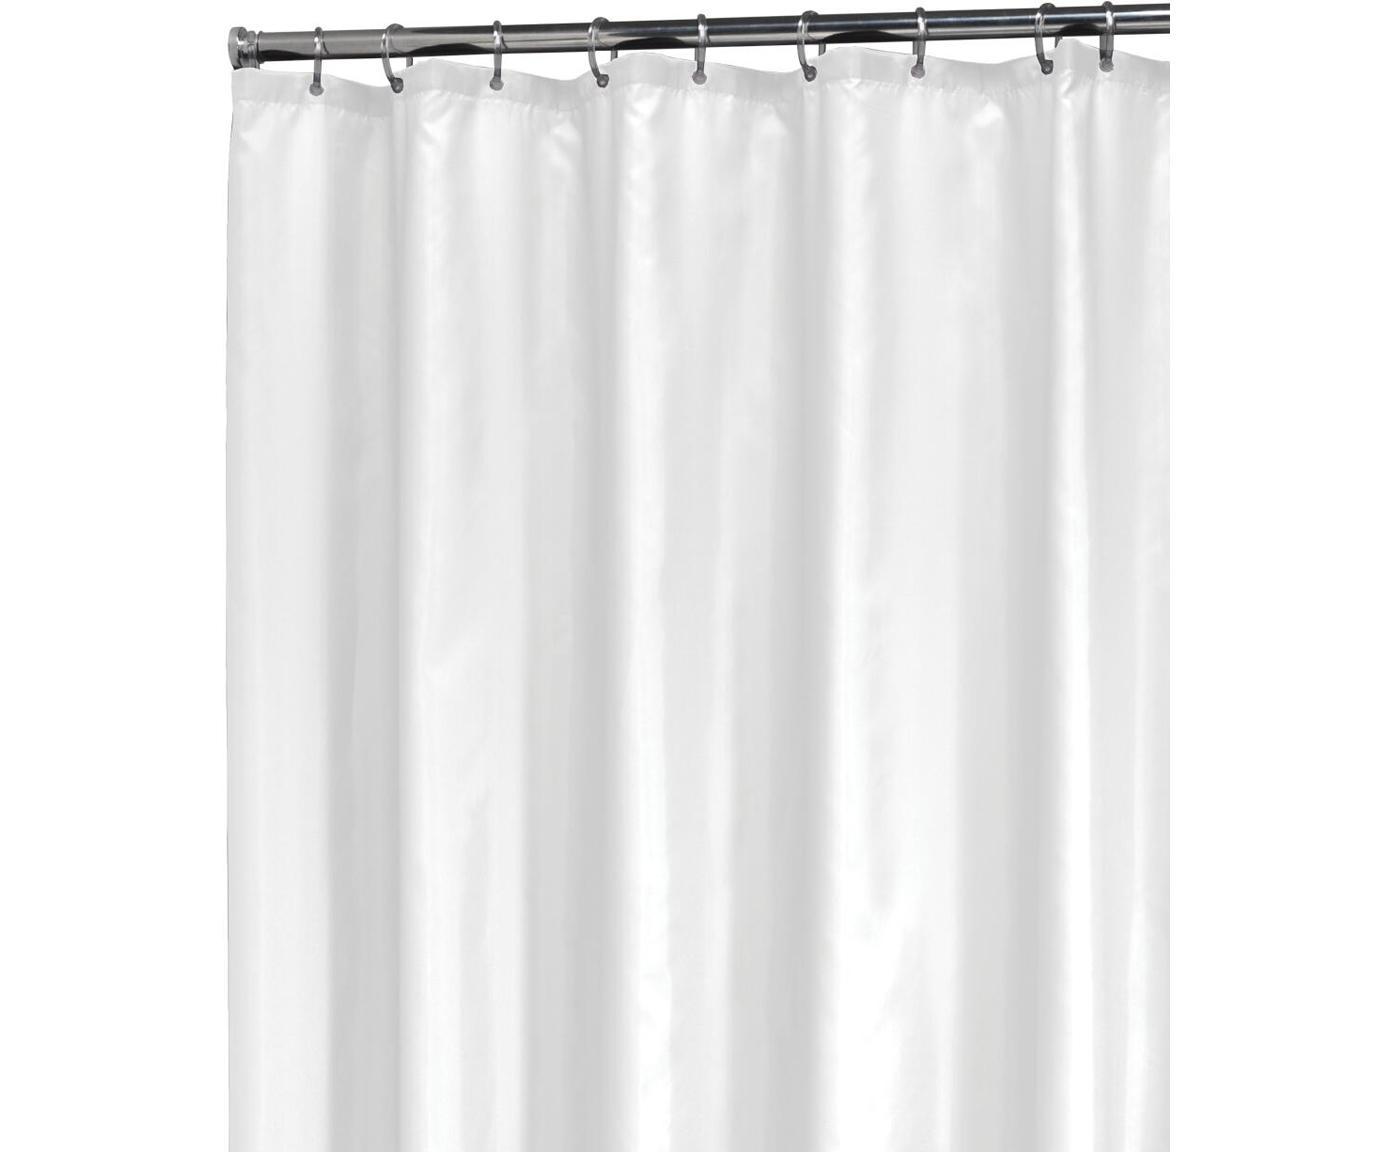 Tenda da doccia bianca Granada, Materiale sintetico (PEVA), impermeabile, Bianco, Larg. 180 x Lung. 200 cm